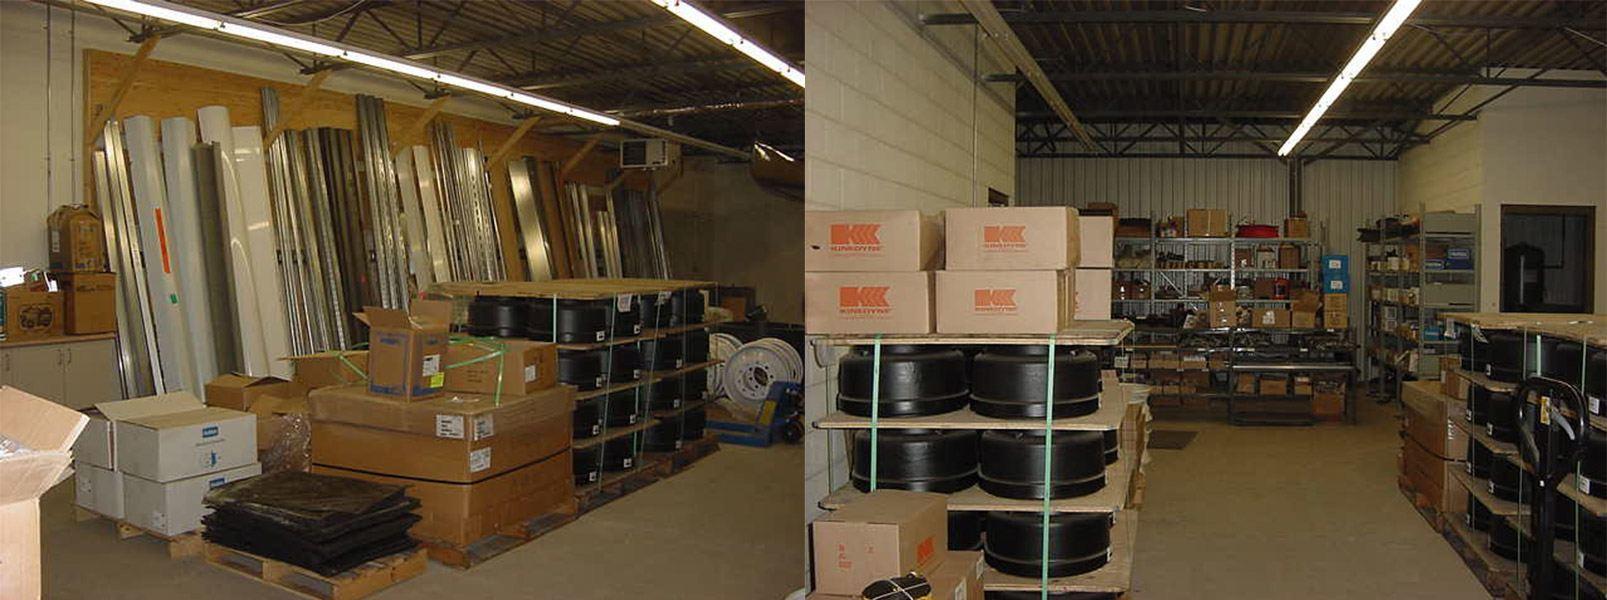 parts-accessories-inventories